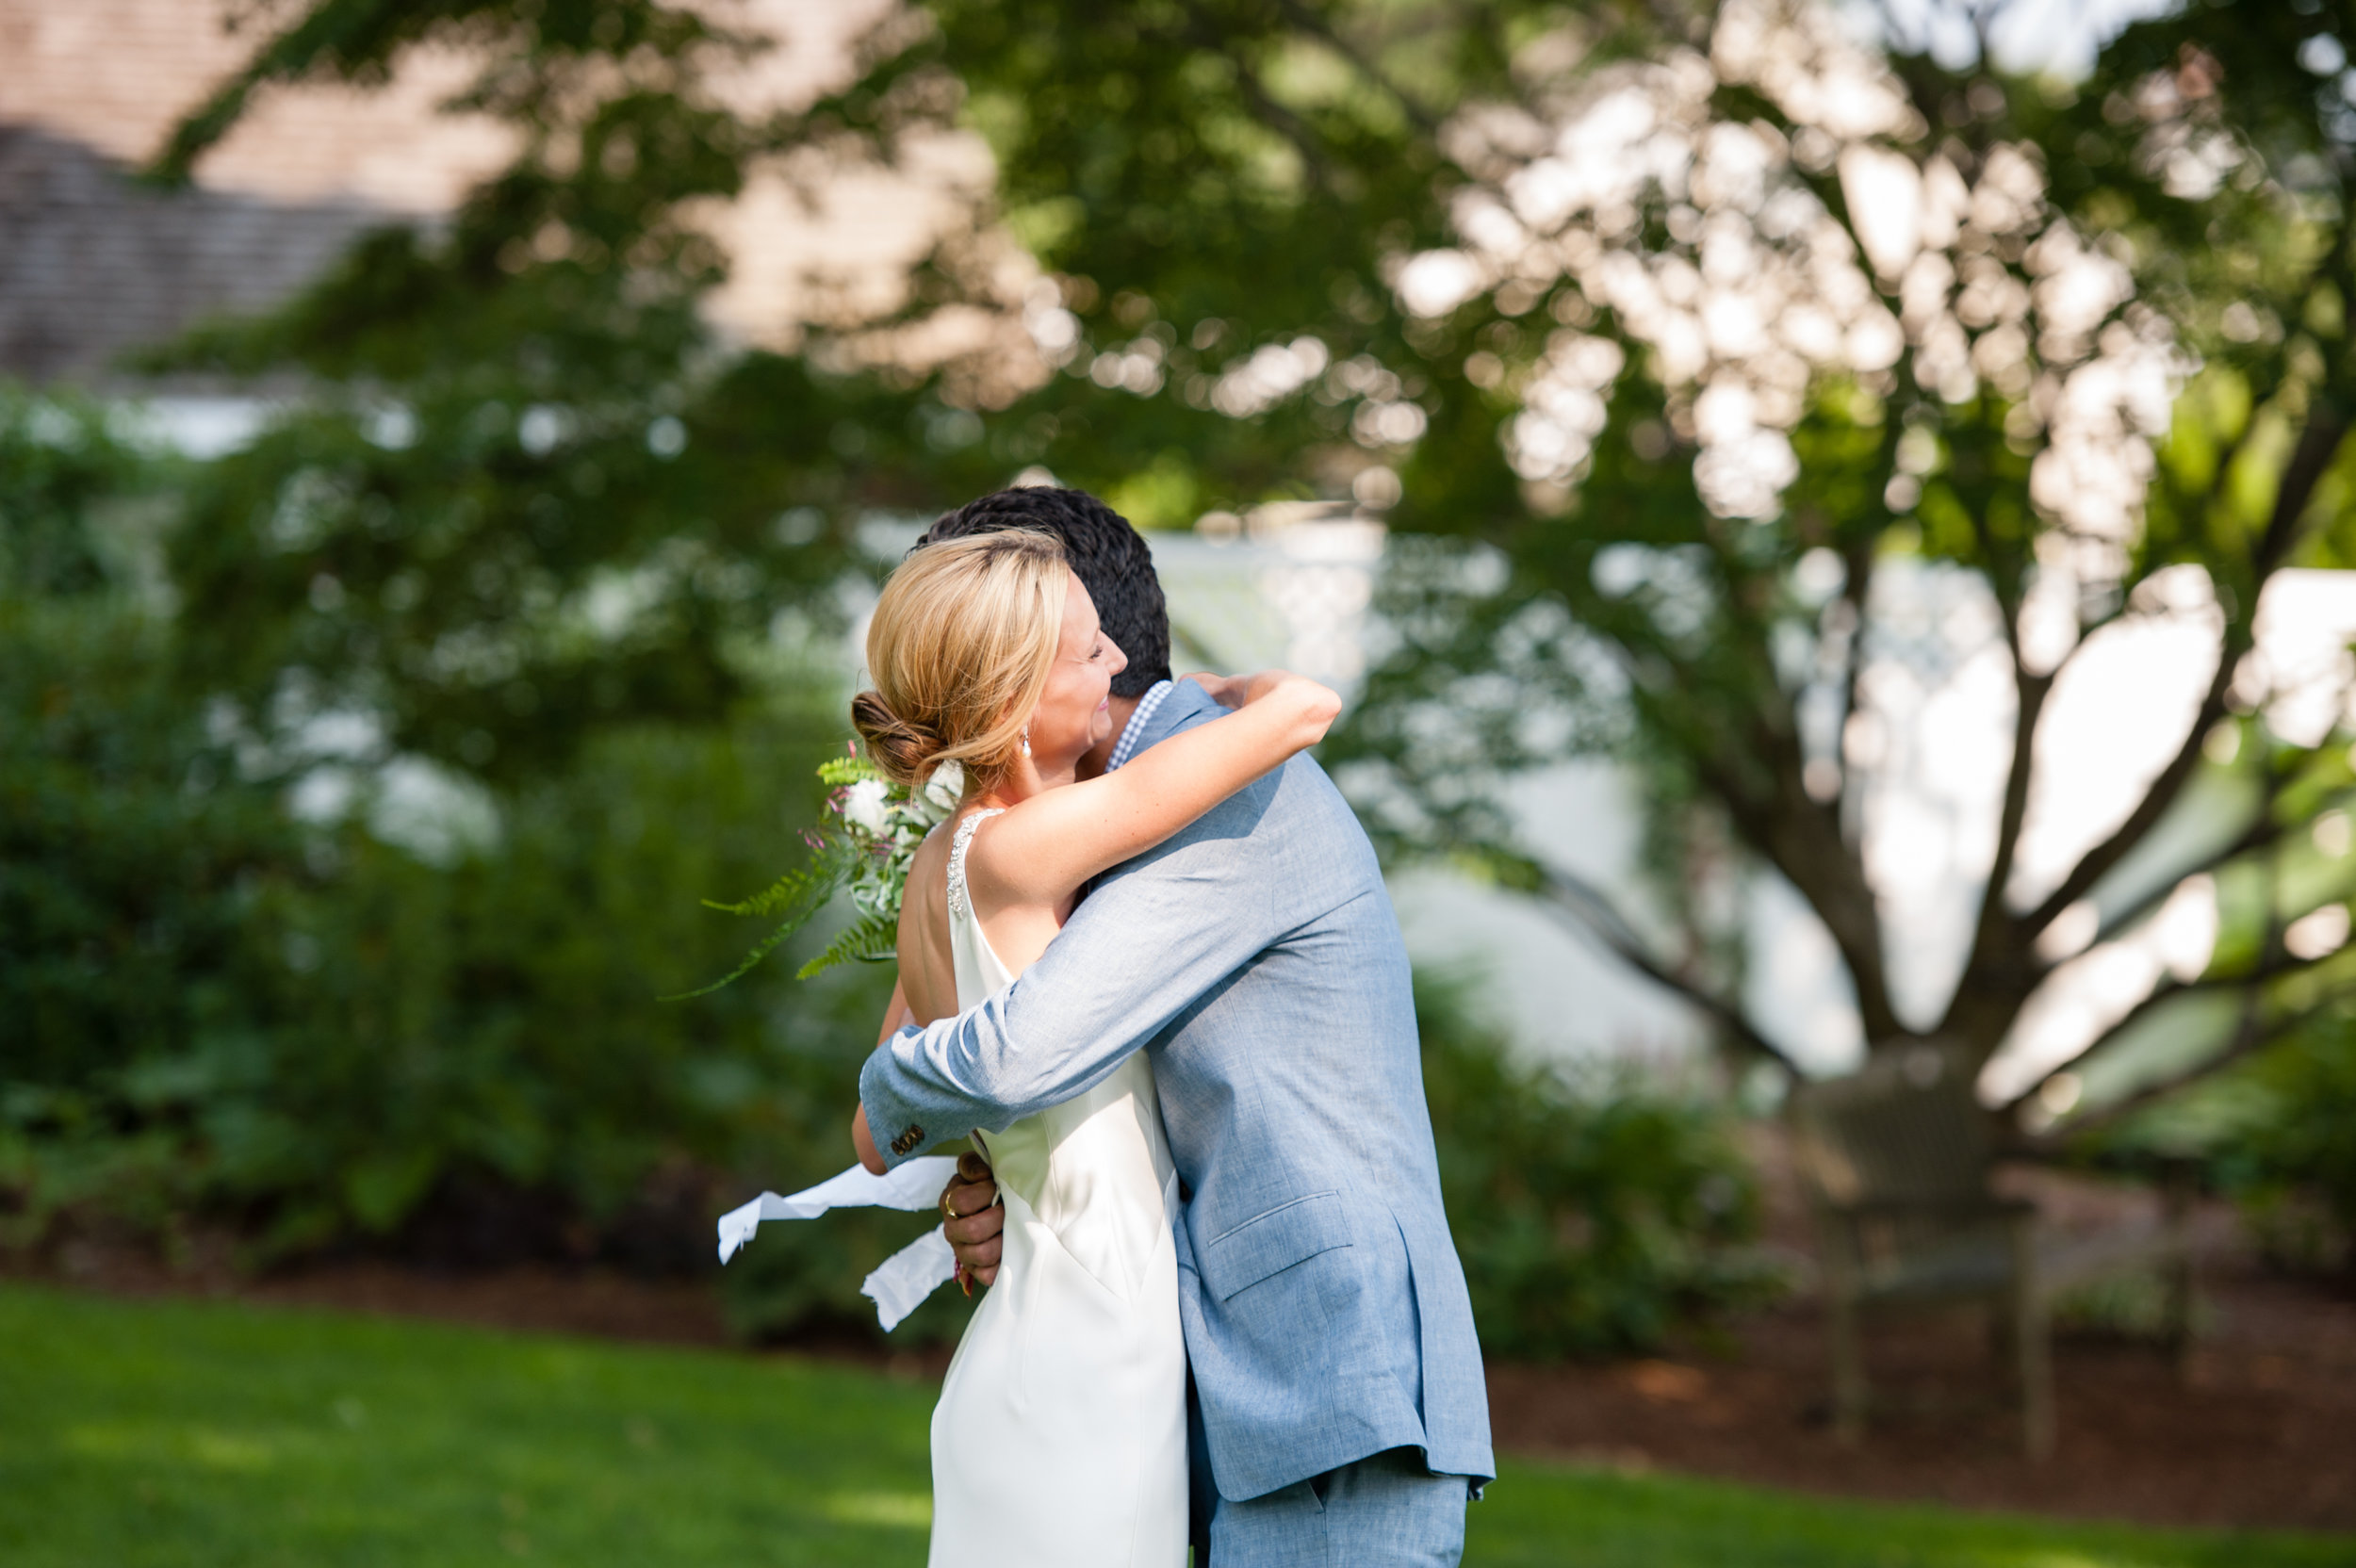 erica_shantanu_wedding-501.jpg